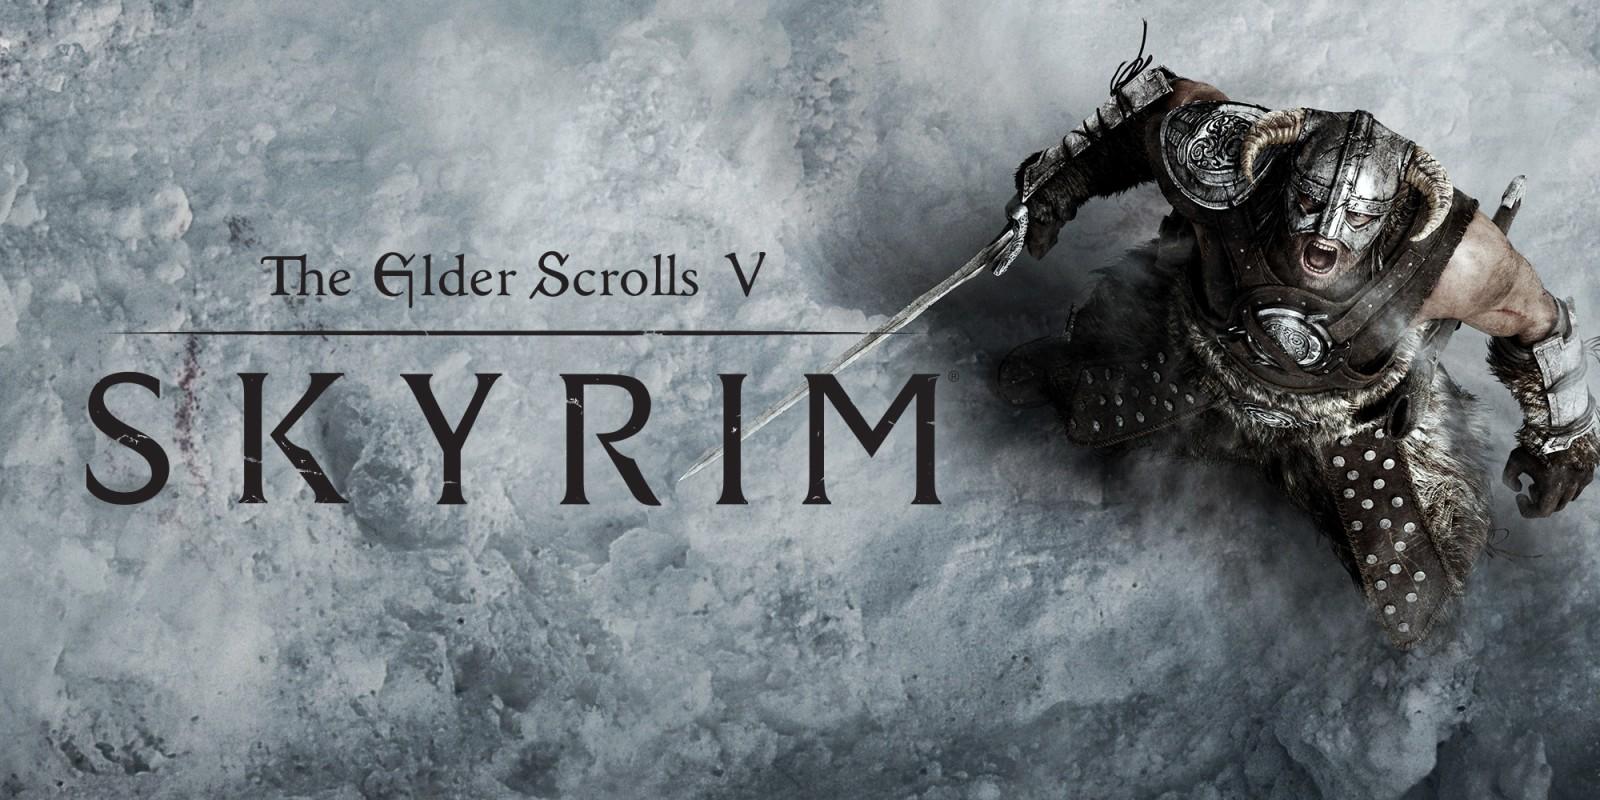 Skyrim The Elder Scrolls V Quick Codes